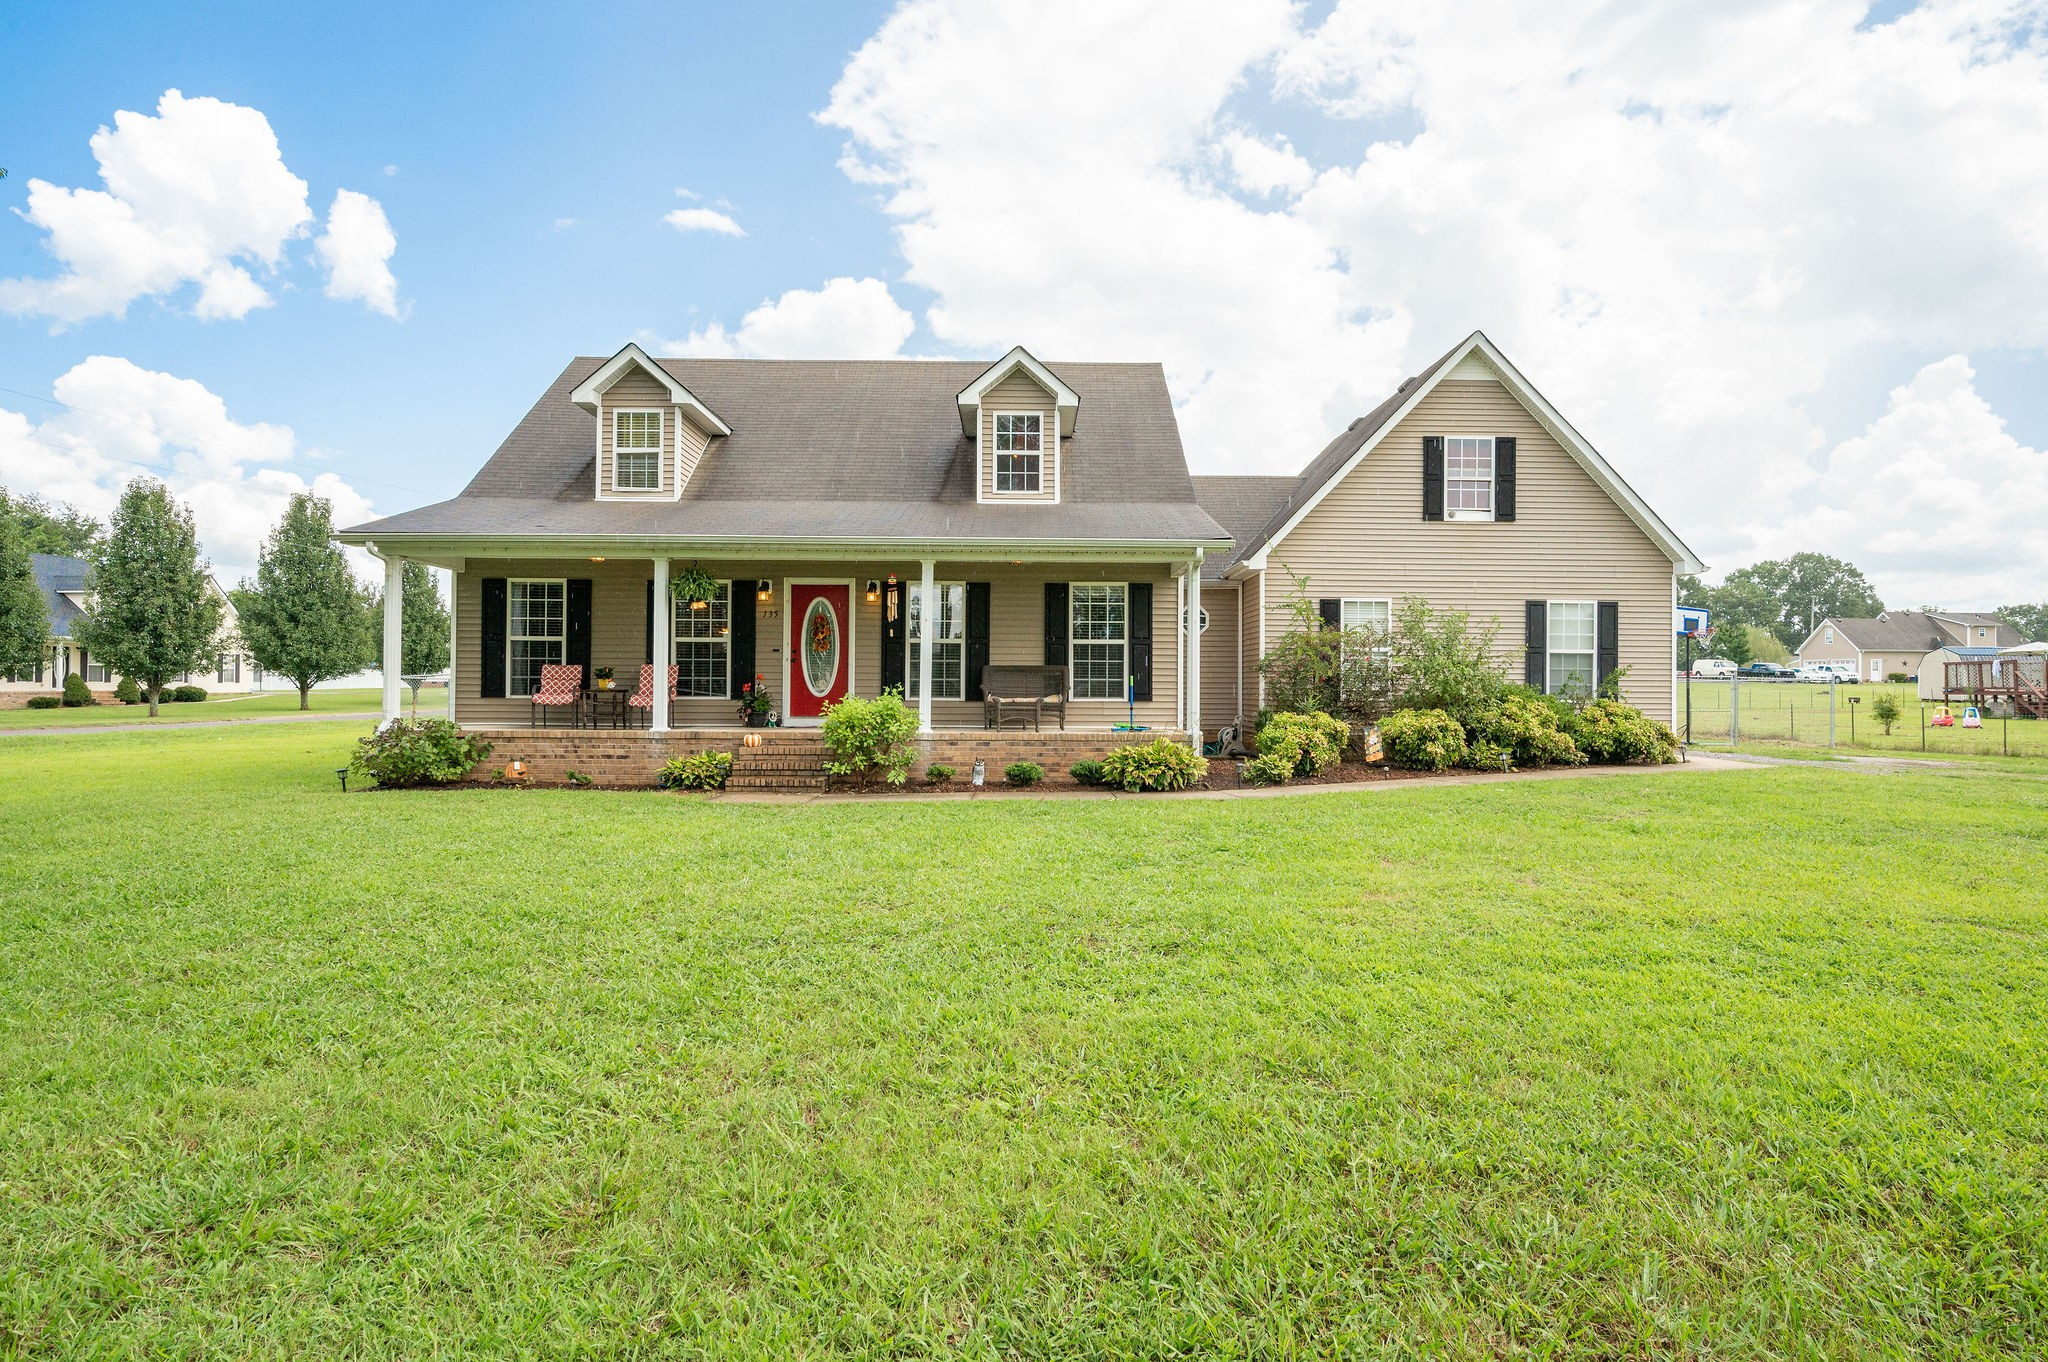 135 Broomsage Cir Property Photo - Unionville, TN real estate listing